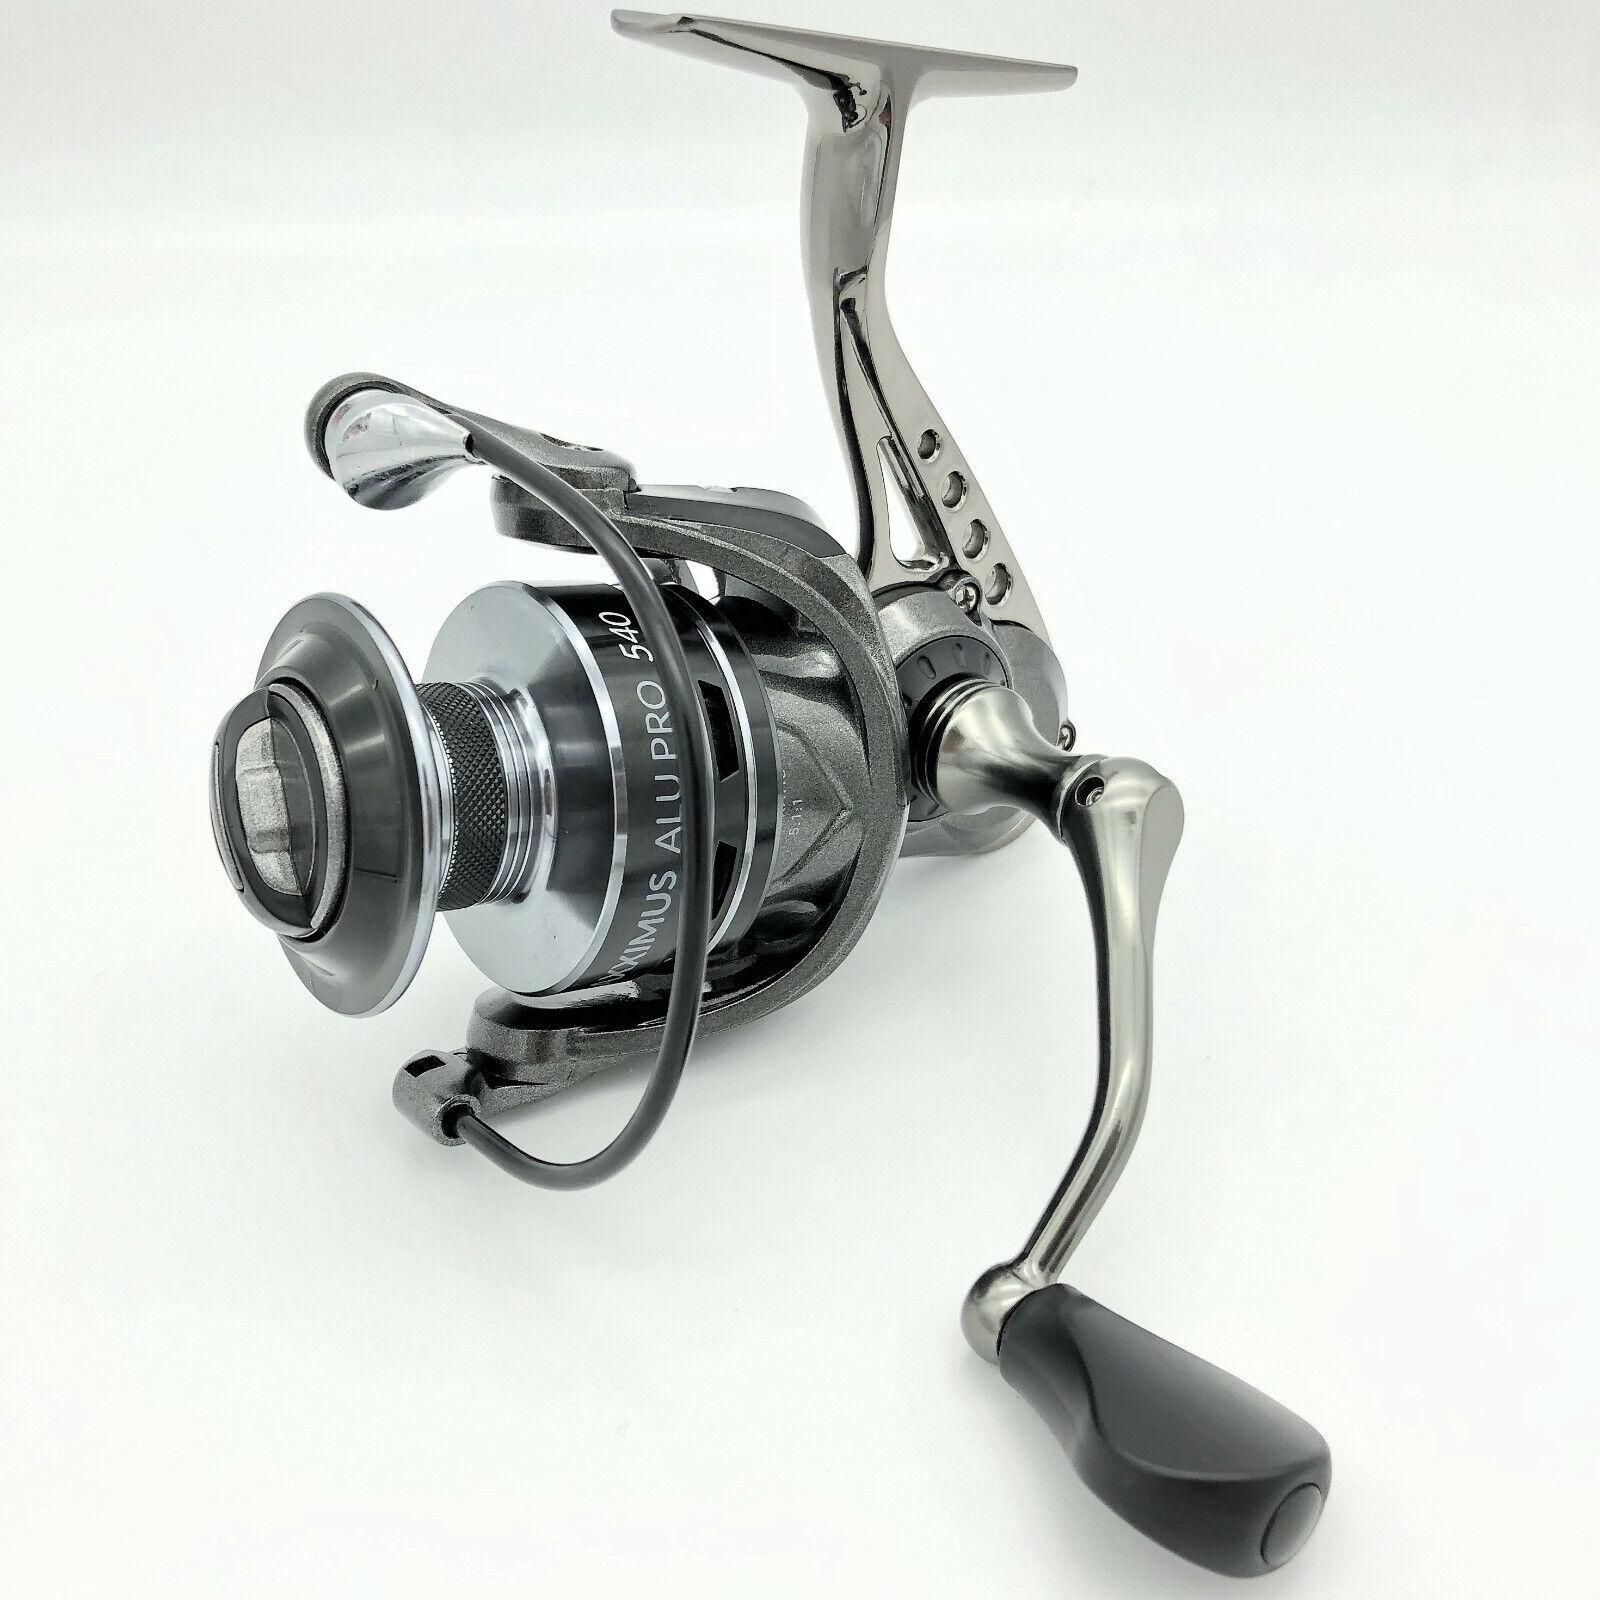 FLADEN Maxximus Alu Pro Pro Pro Spinrolle - Spin Rolle   Angelrolle - 2000er bis 4000er ee3f72